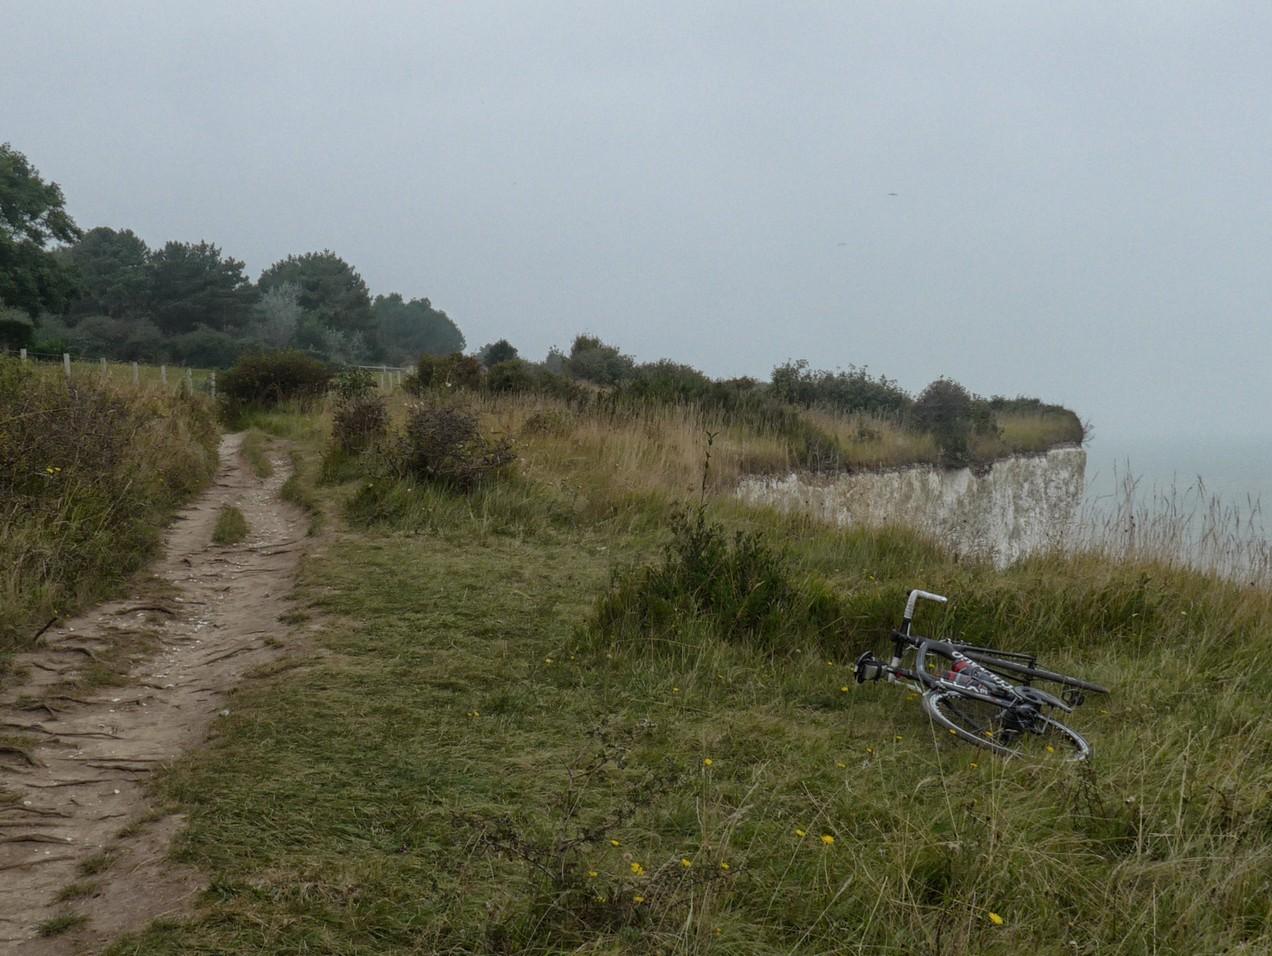 ... not exactly road bike territory!